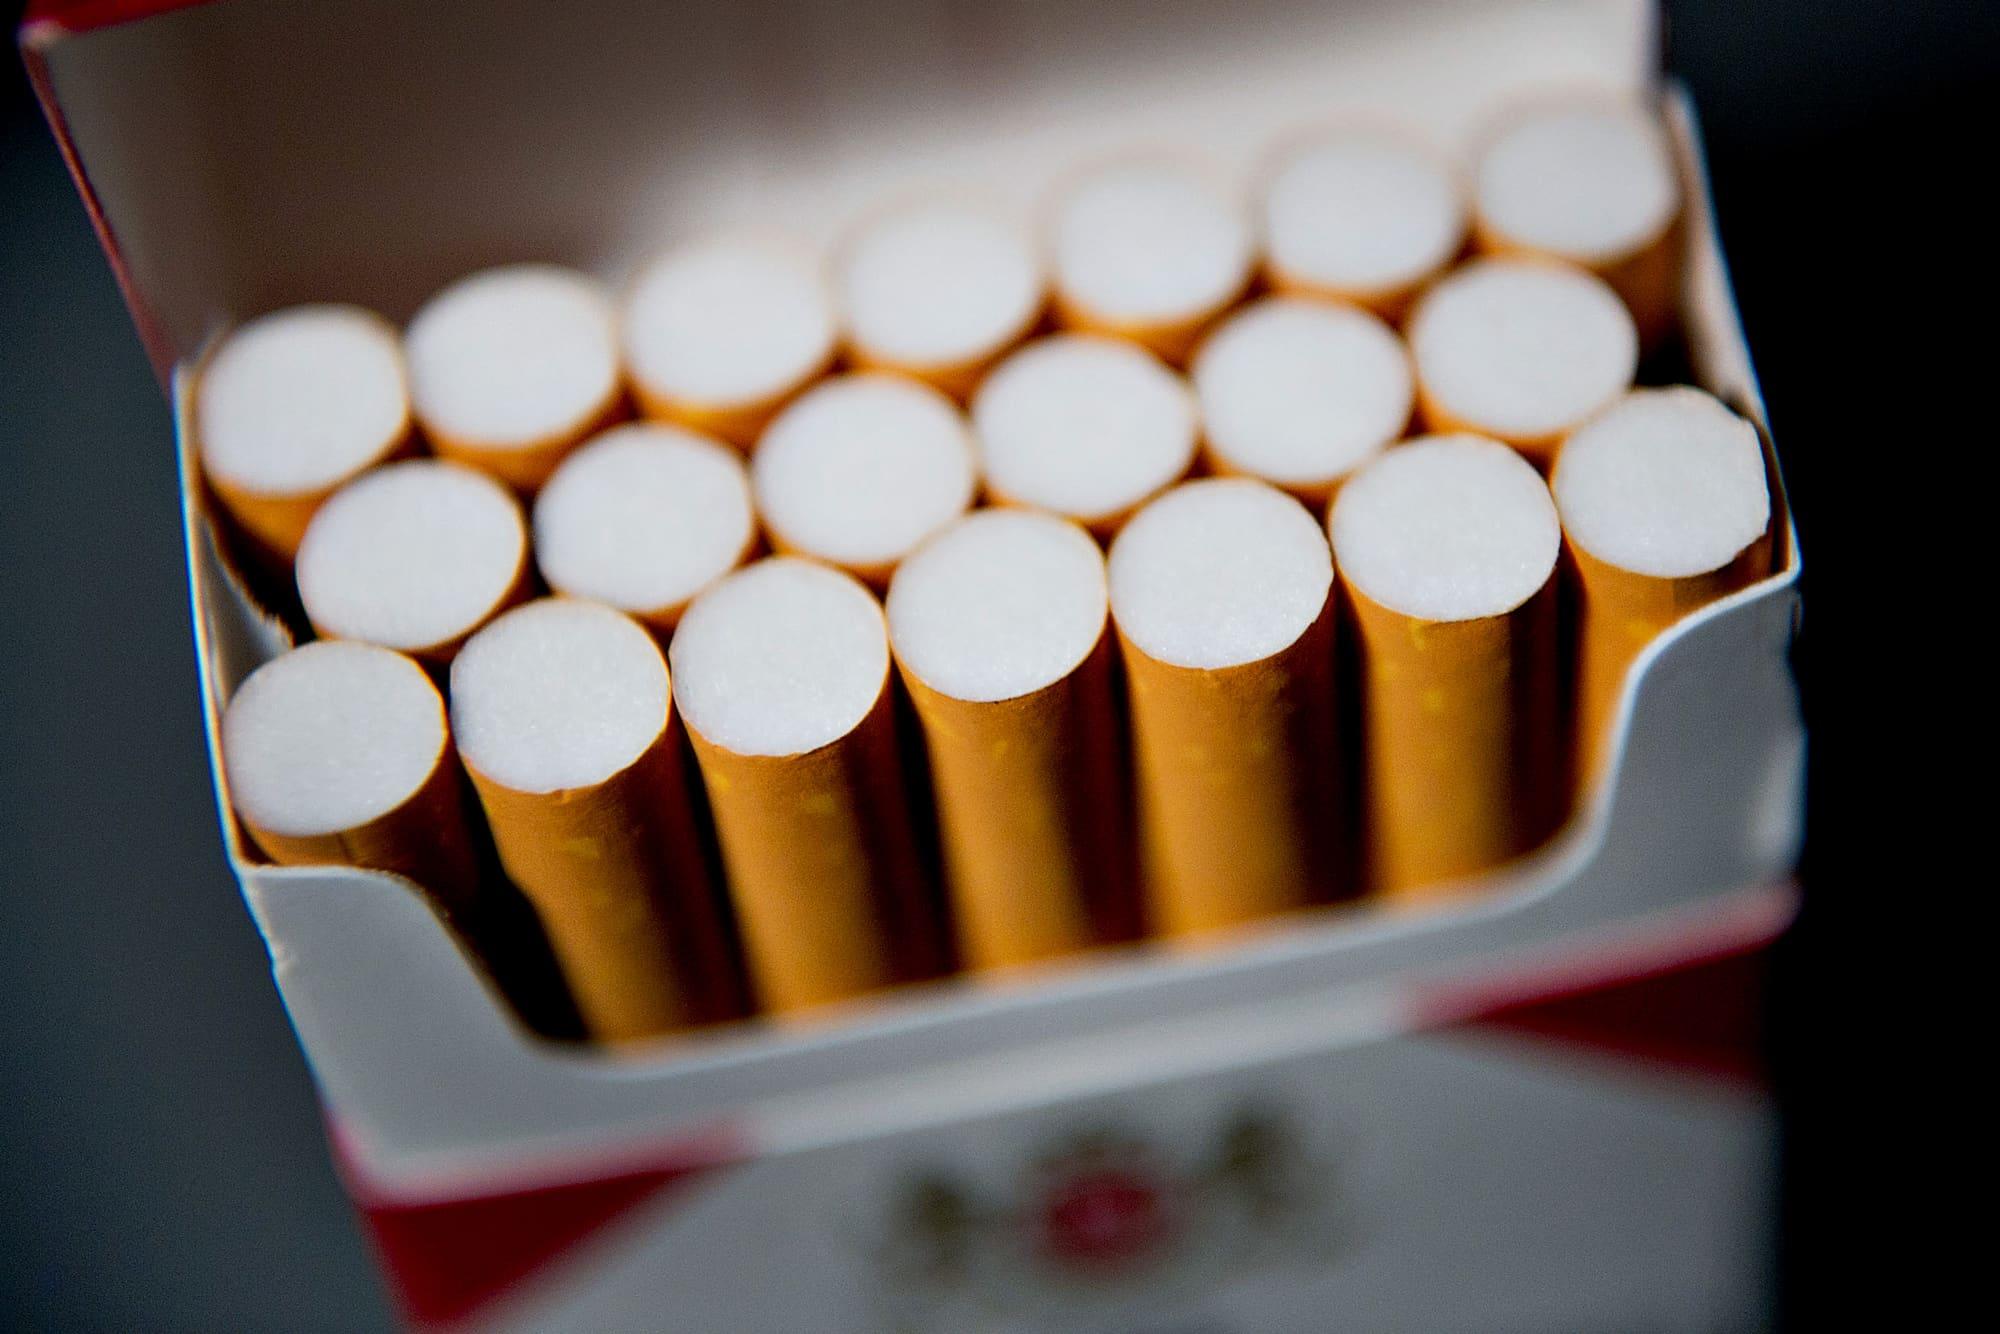 altria-said-cigarette-industry-shipments-flattened-in-2020